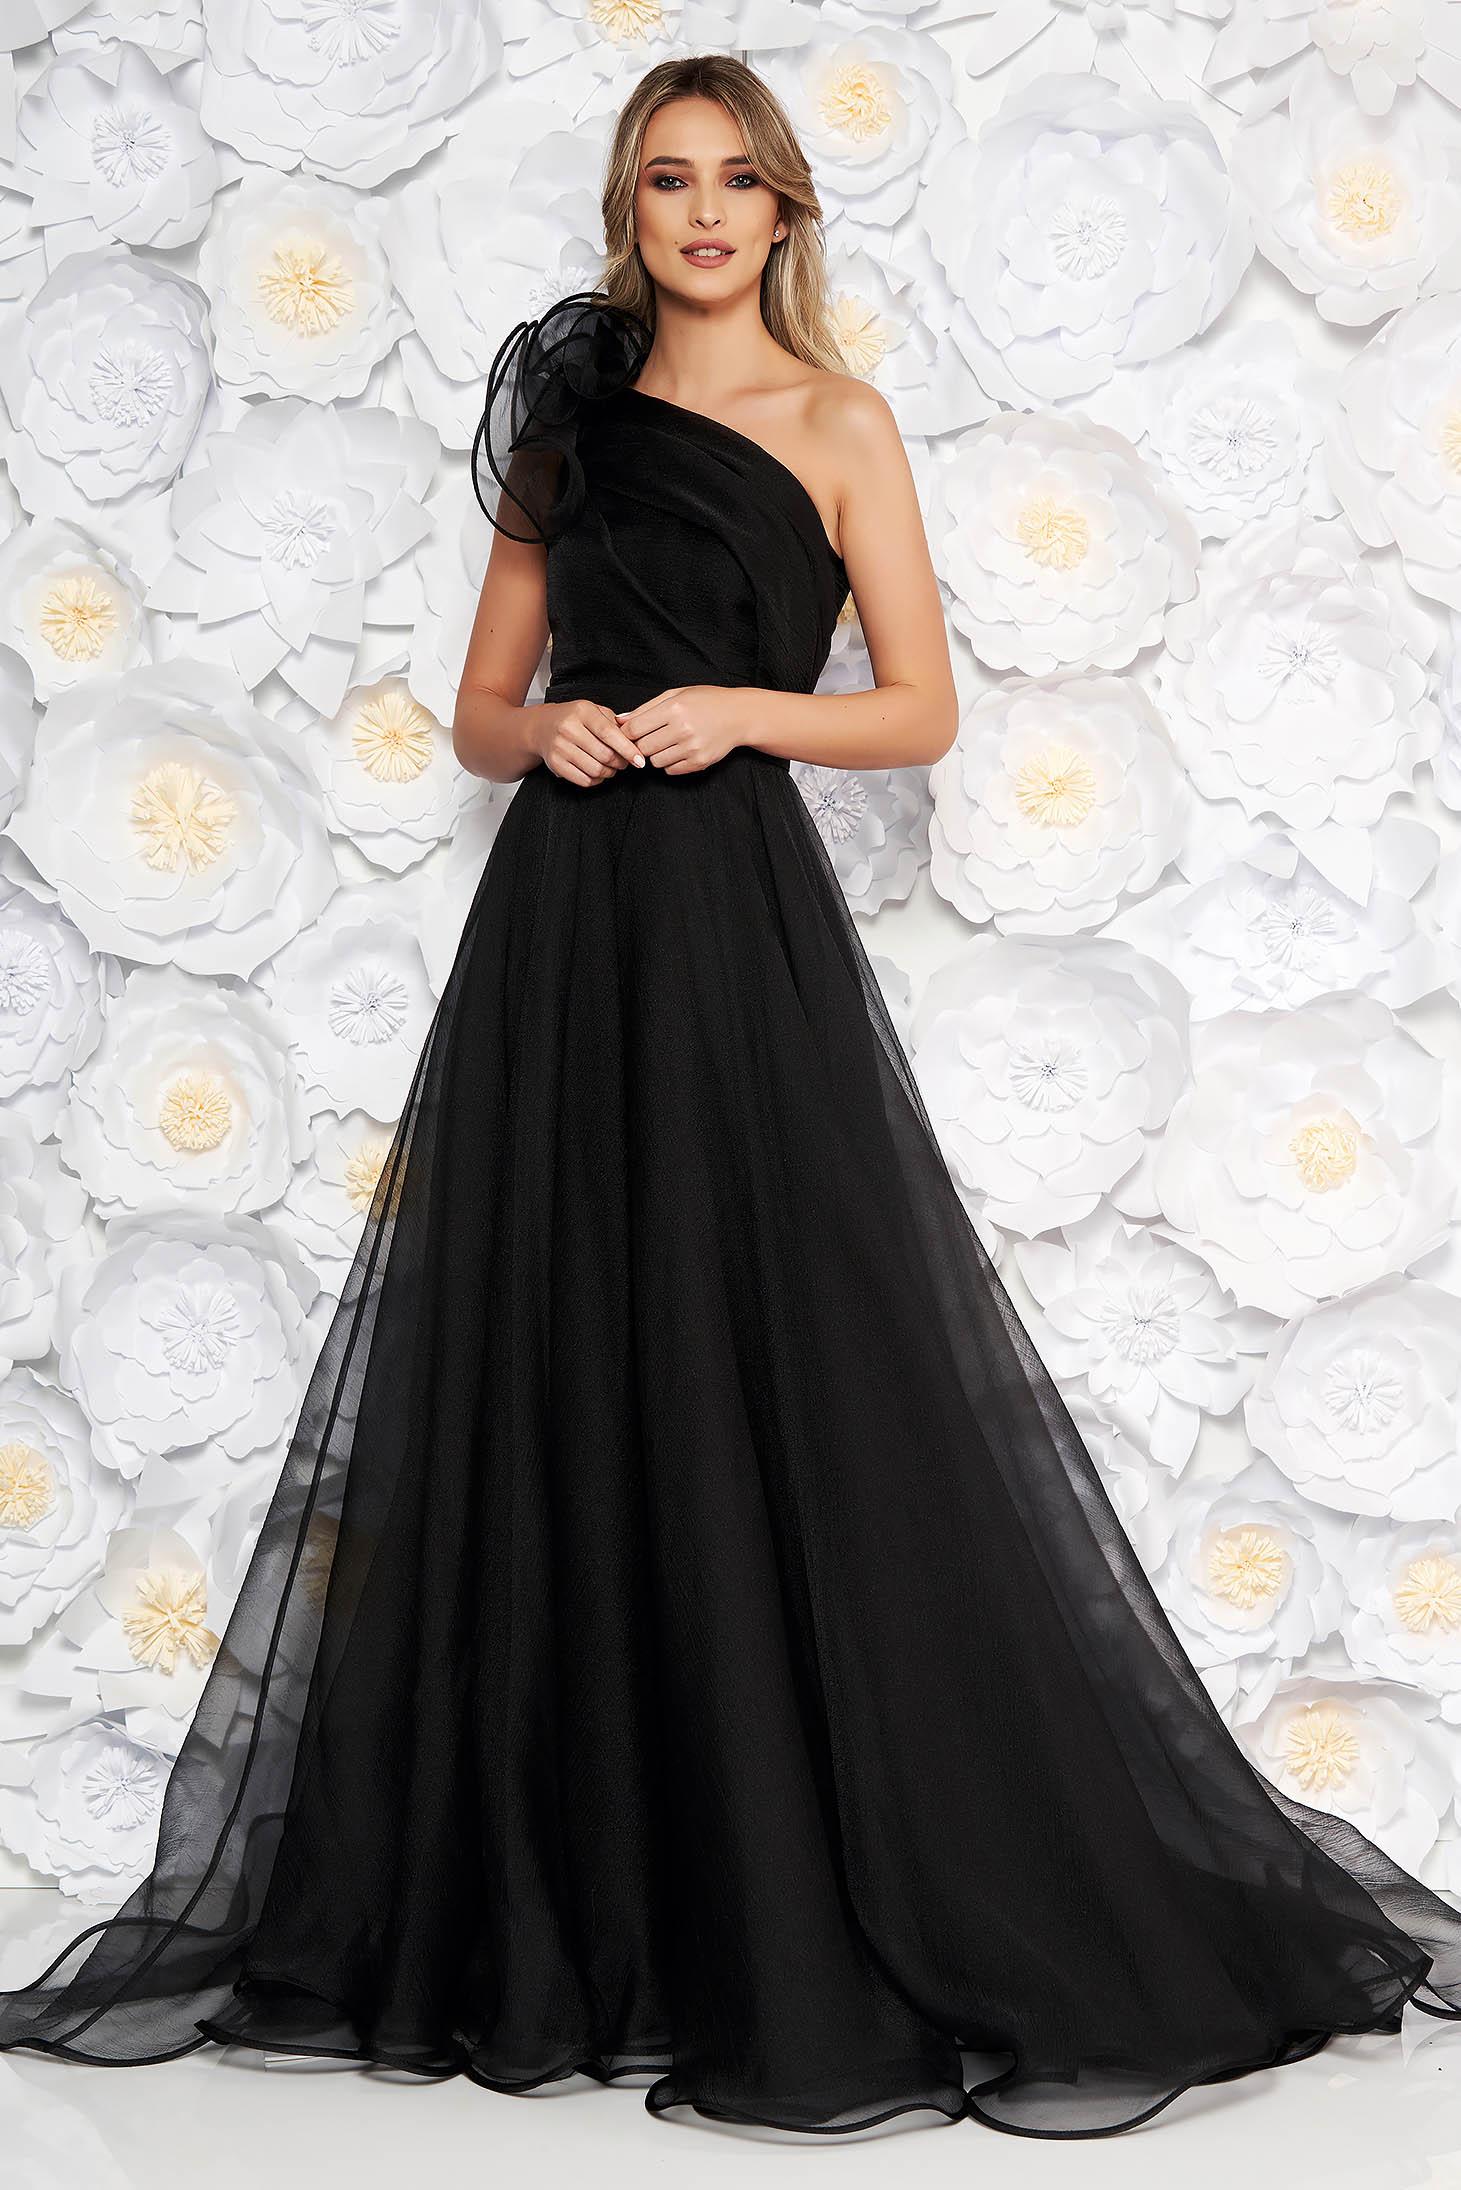 Ana Radu black luxurious dress with inside lining accessorized with tied waistband one shoulder